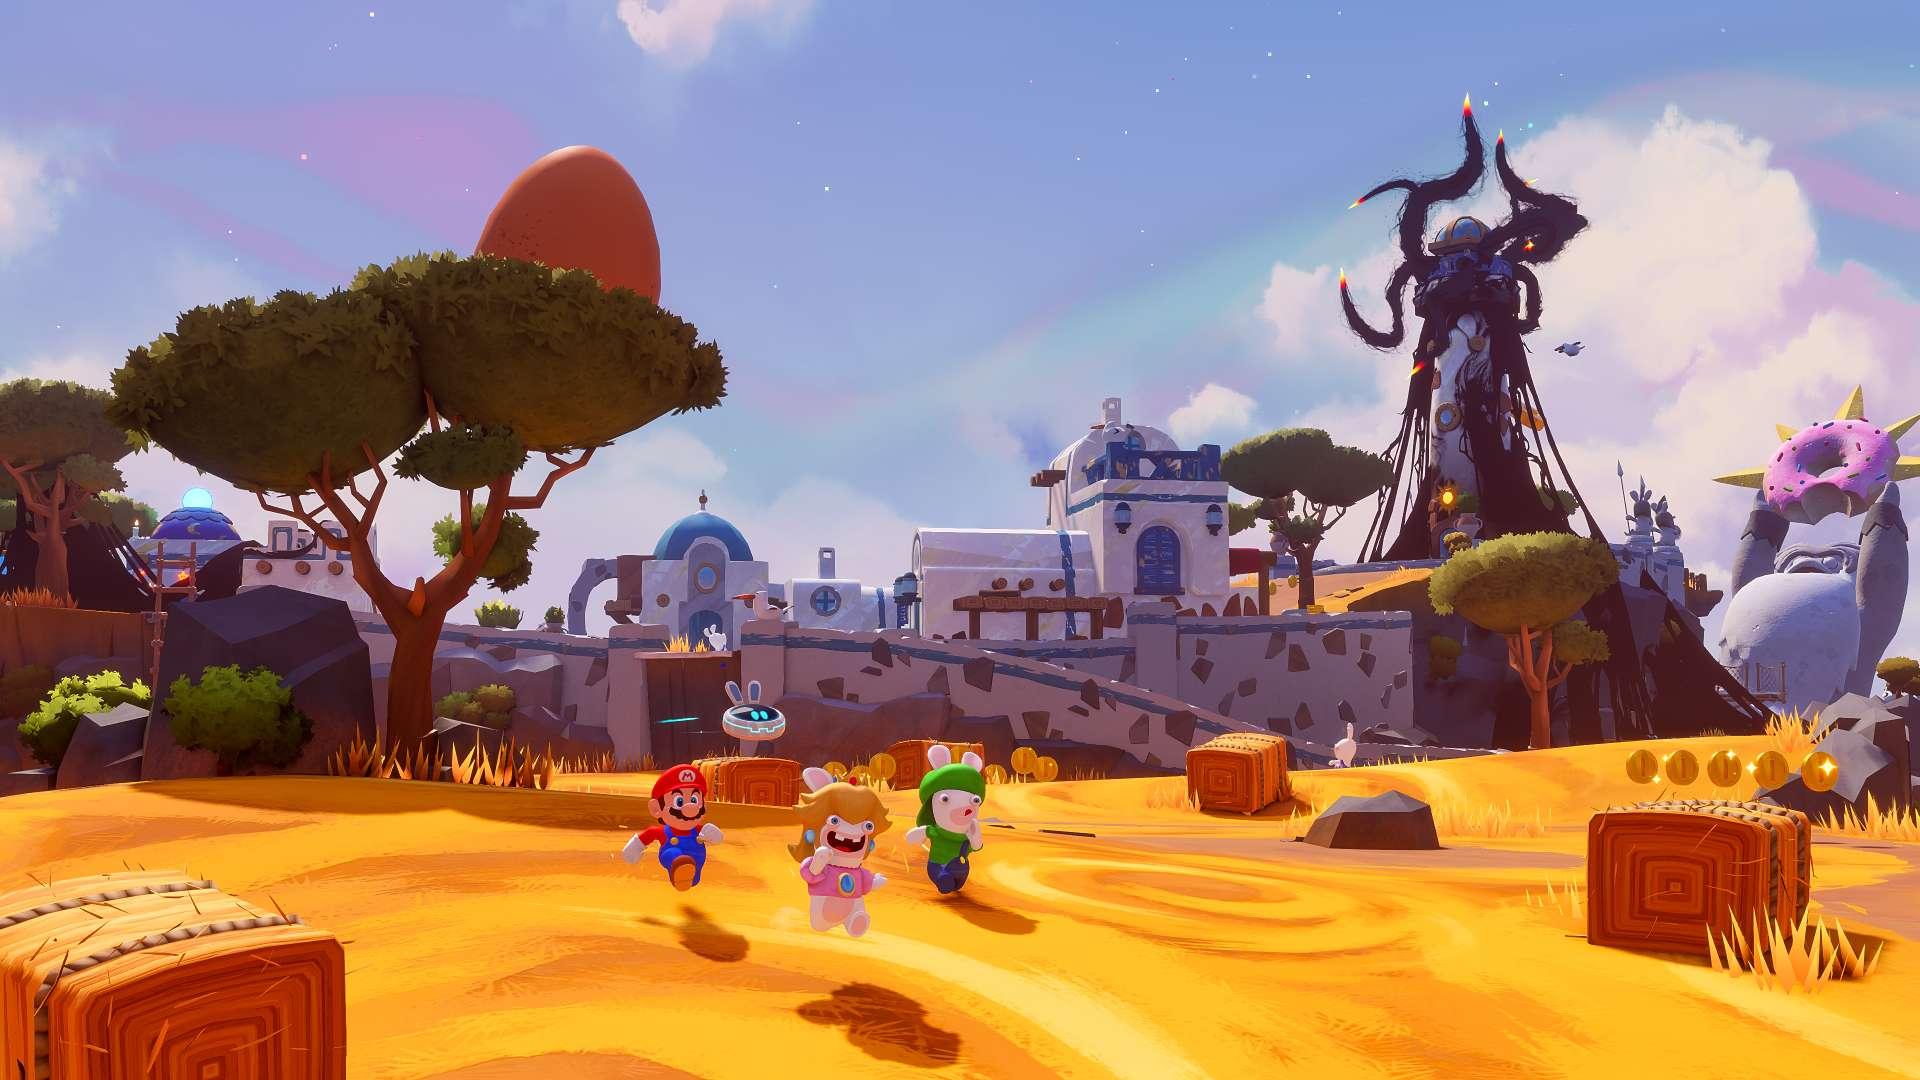 Mario Rabbids Sparks of Hope Screenshot 3 - Ubisoft presenta Mario + Rabbids Sparks of Hope para Nintendo Switch